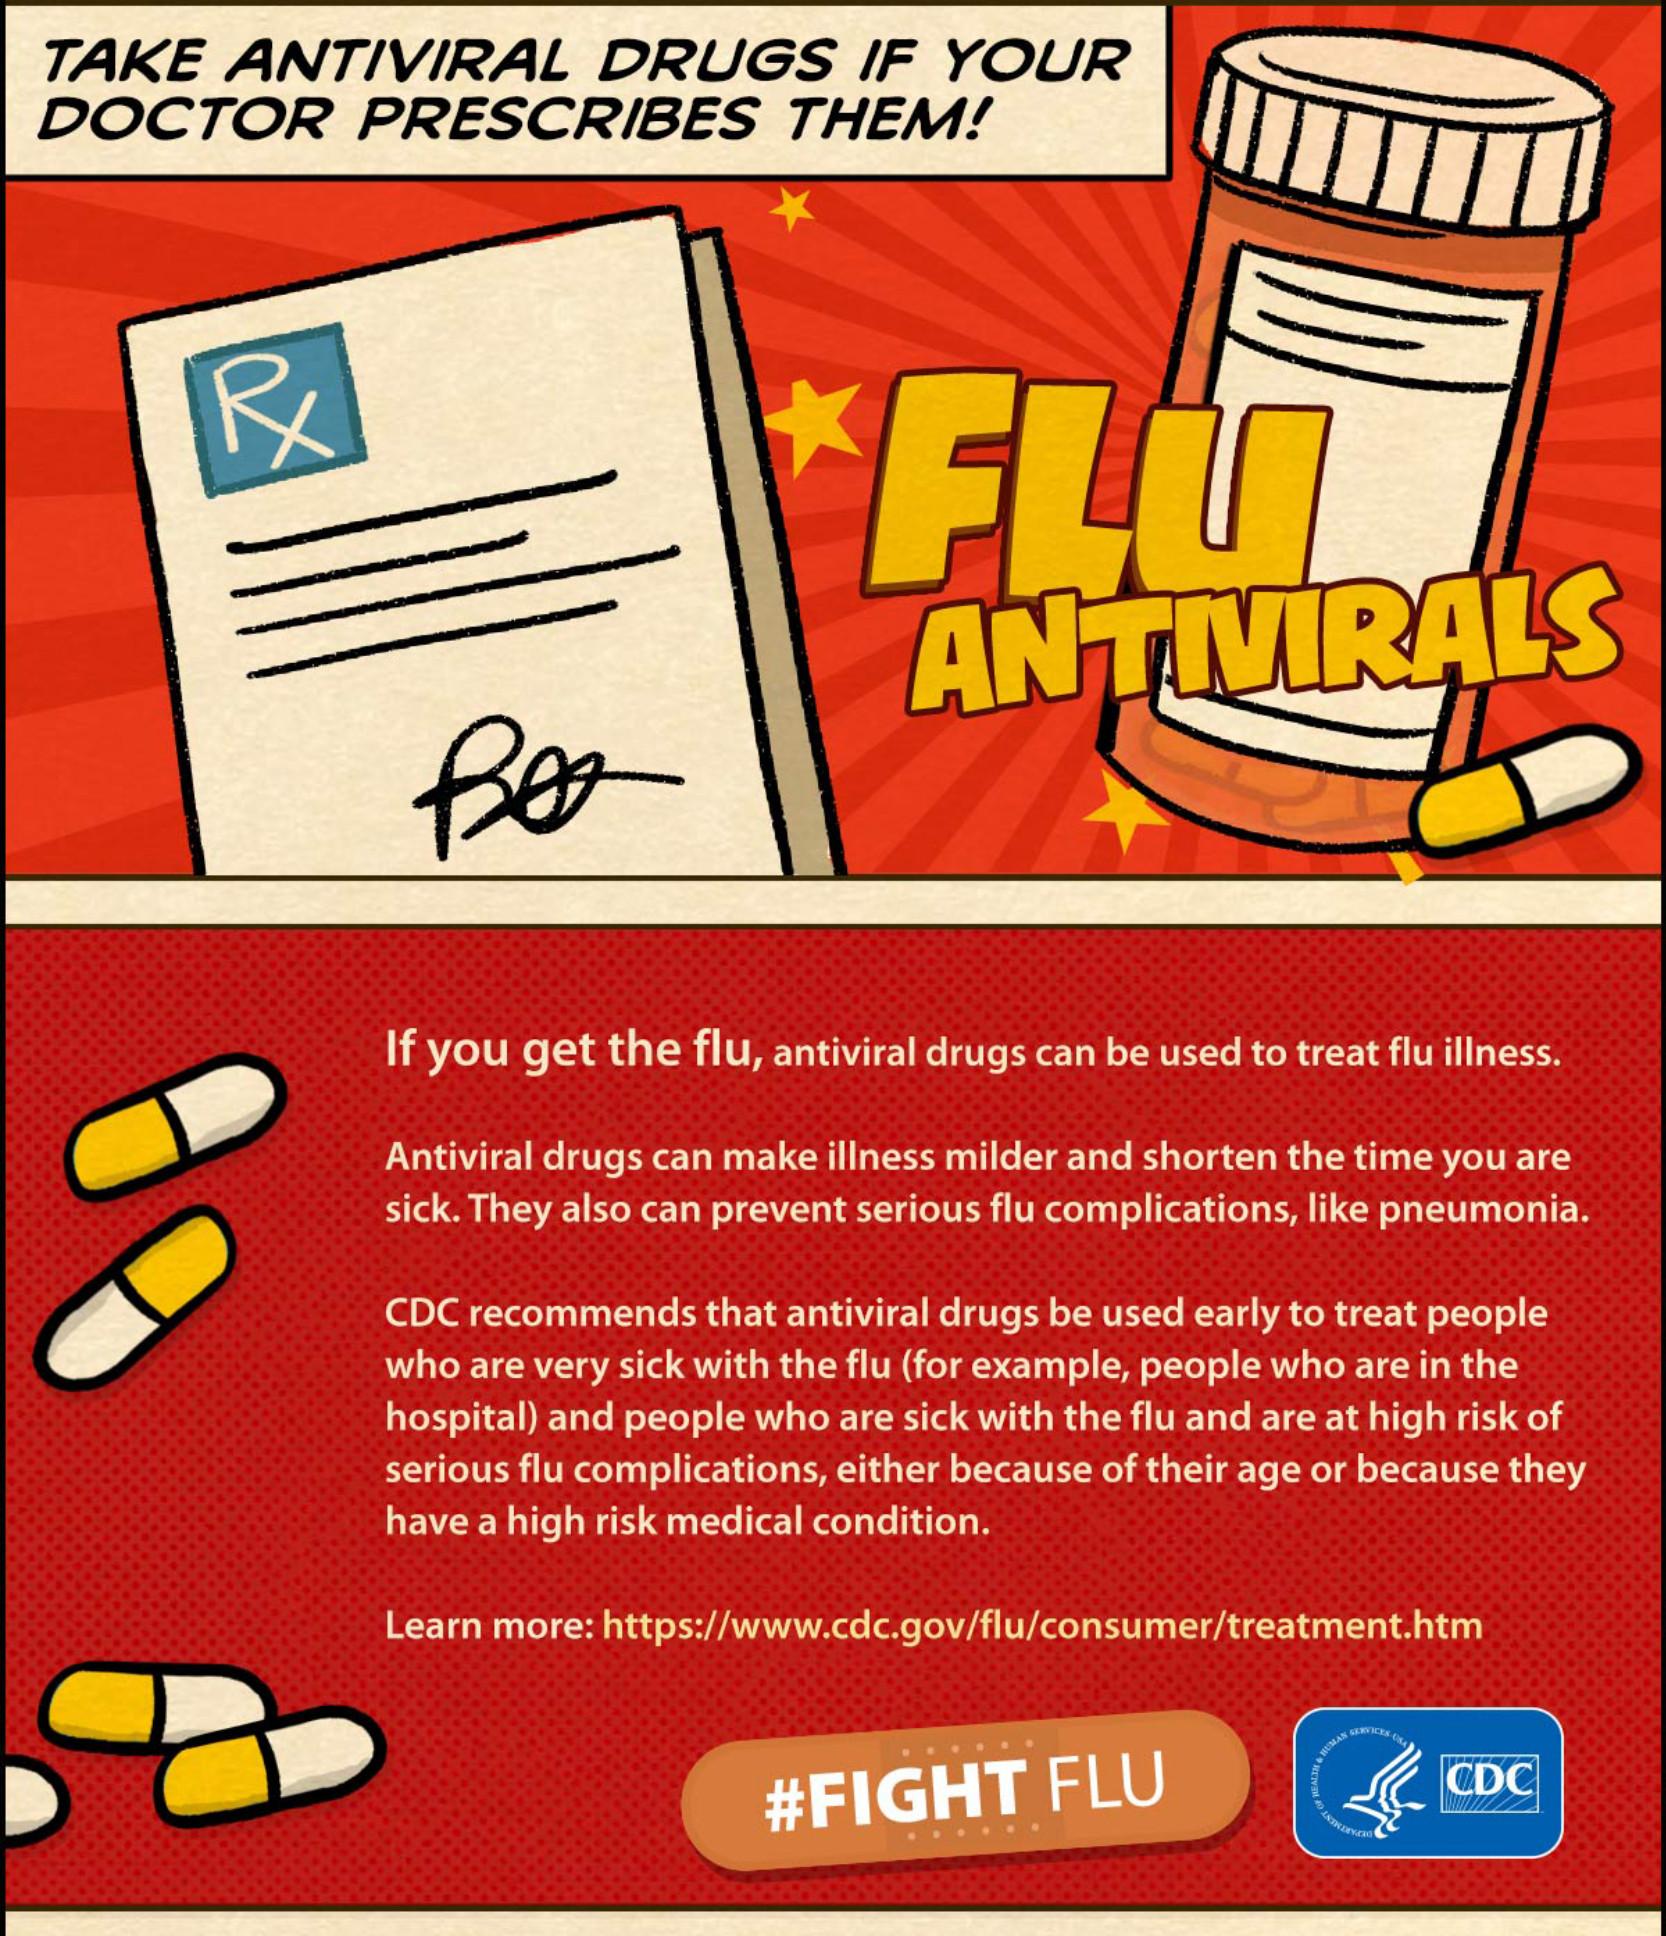 flu-antiviral-meds